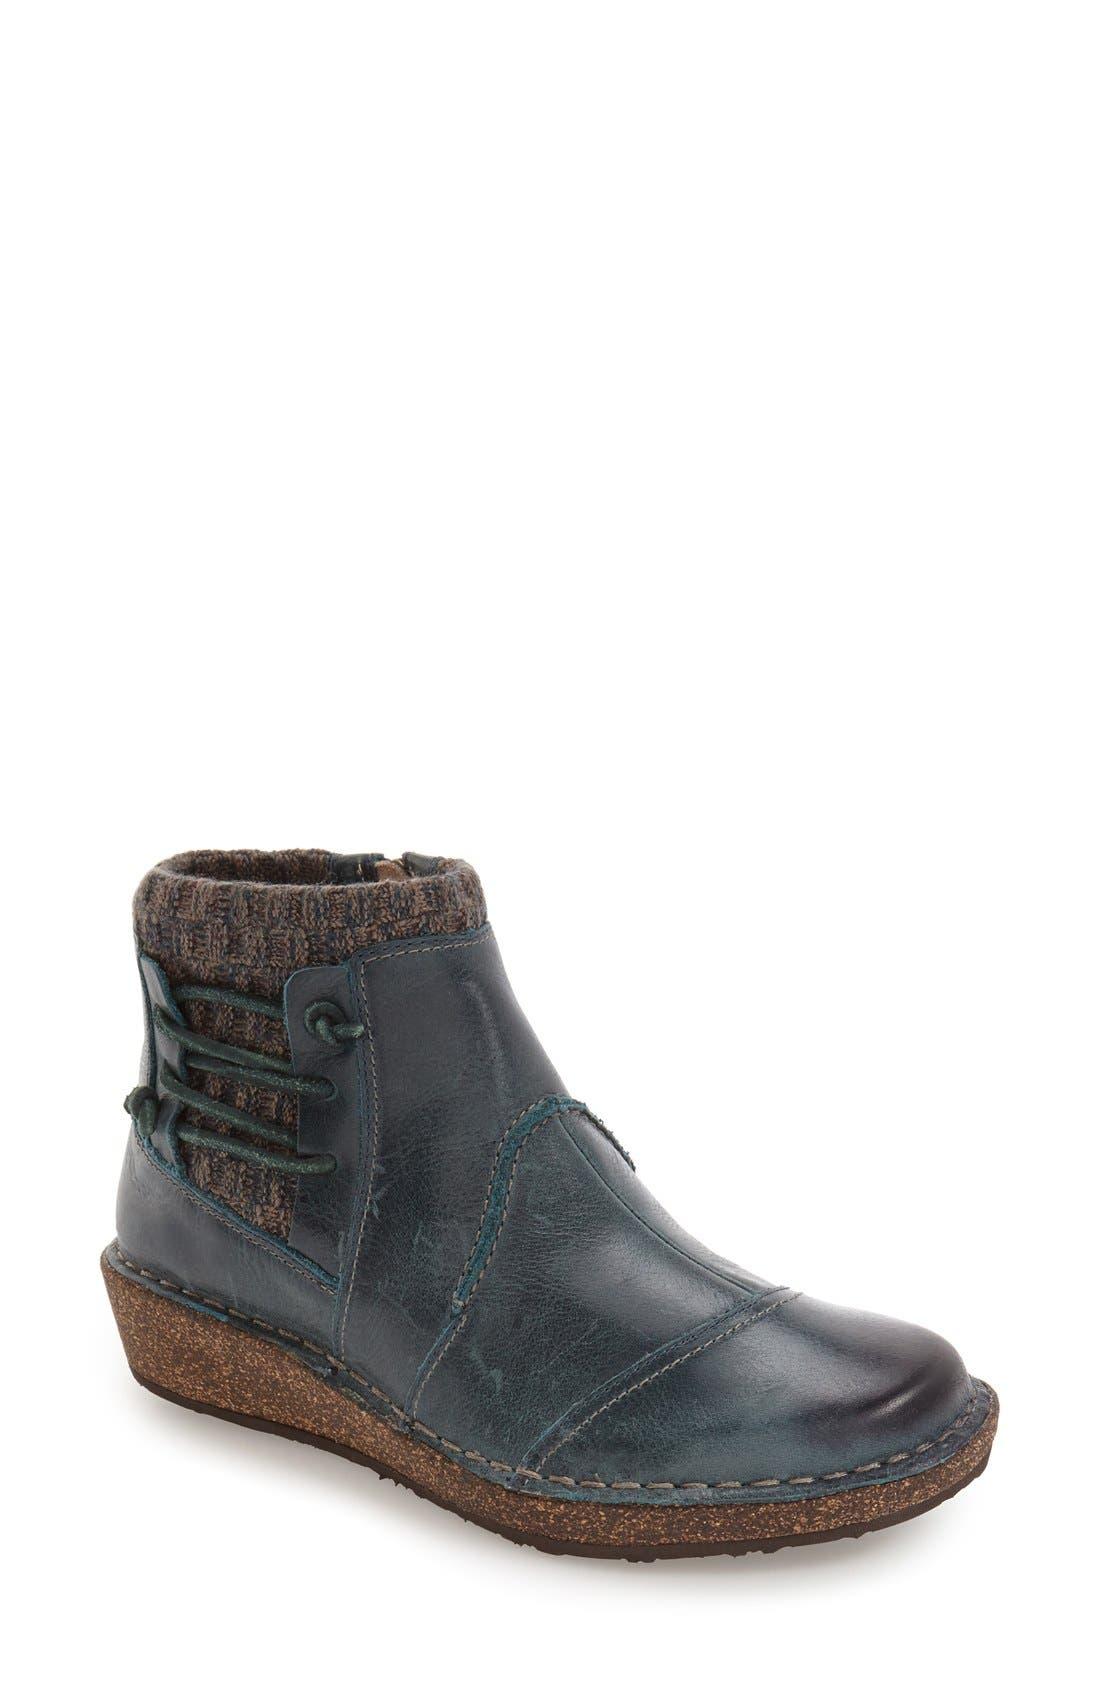 AETREX 'Tessa' Ankle Boot